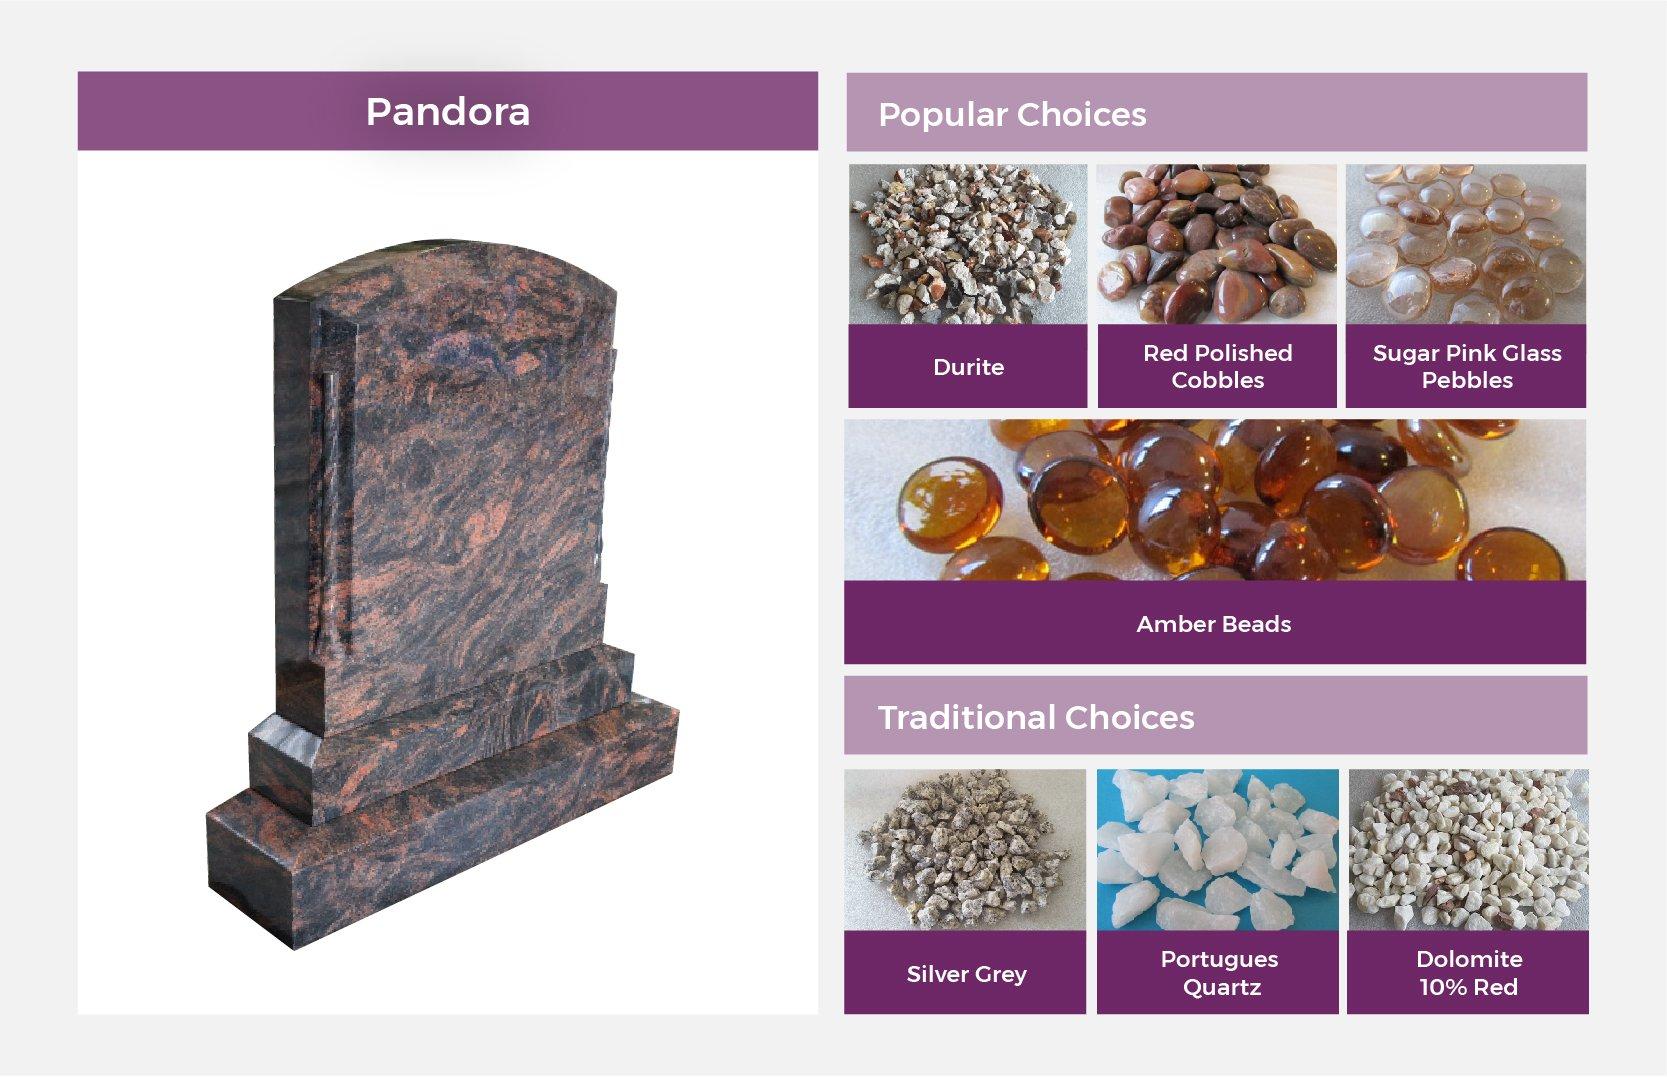 Pandora Headstone matched stones